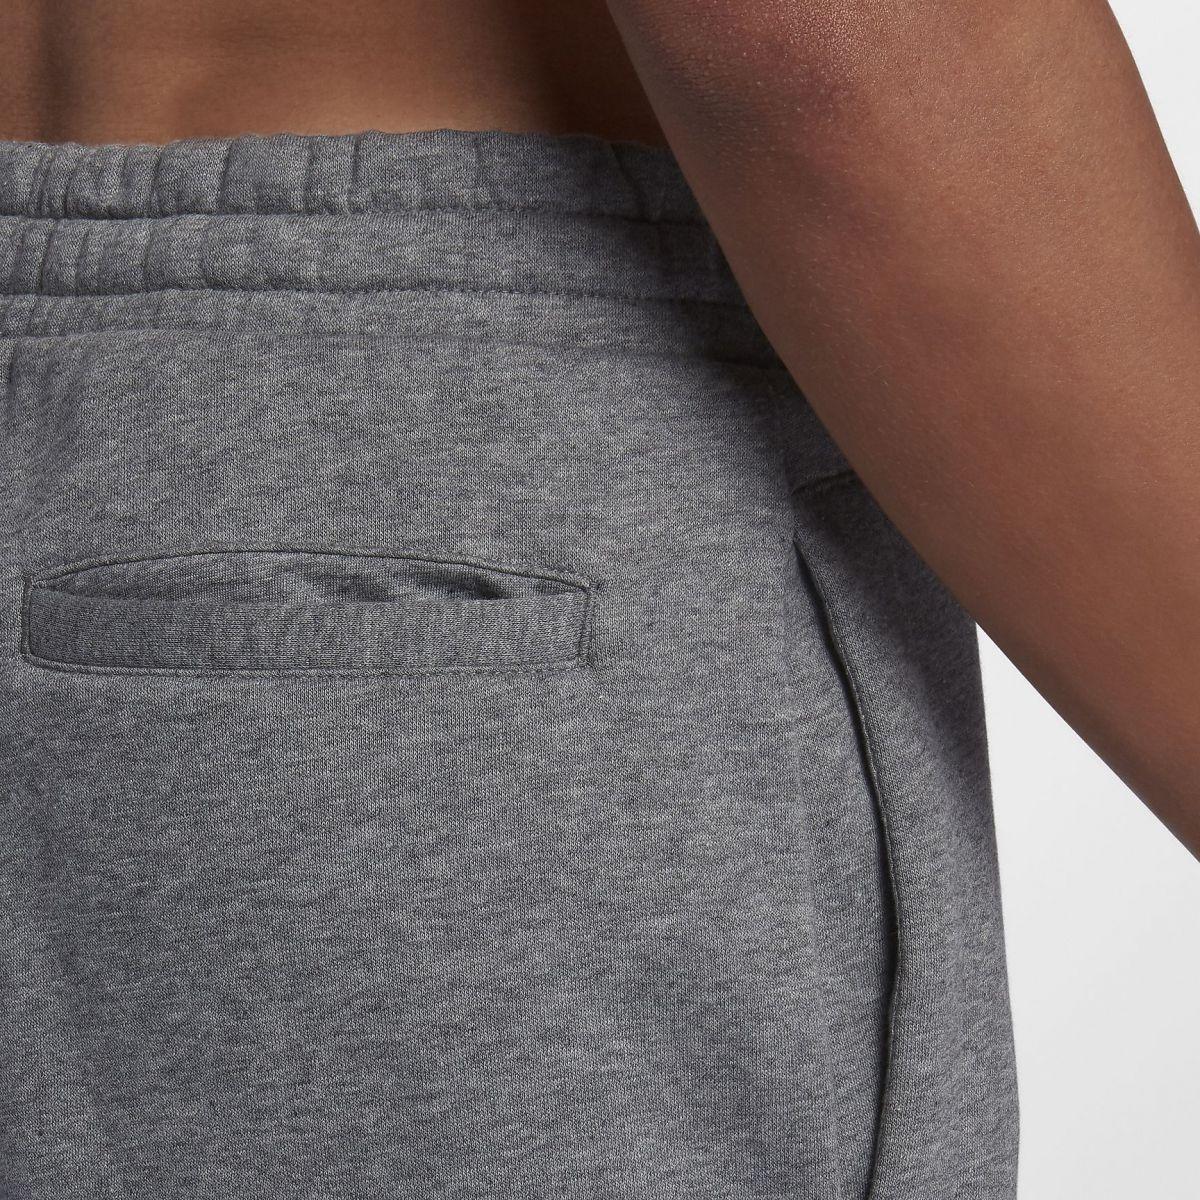 ef2b5e13f70 Type Pants Jordan Sportswear Jumpman Air Graphic Fleece Pants